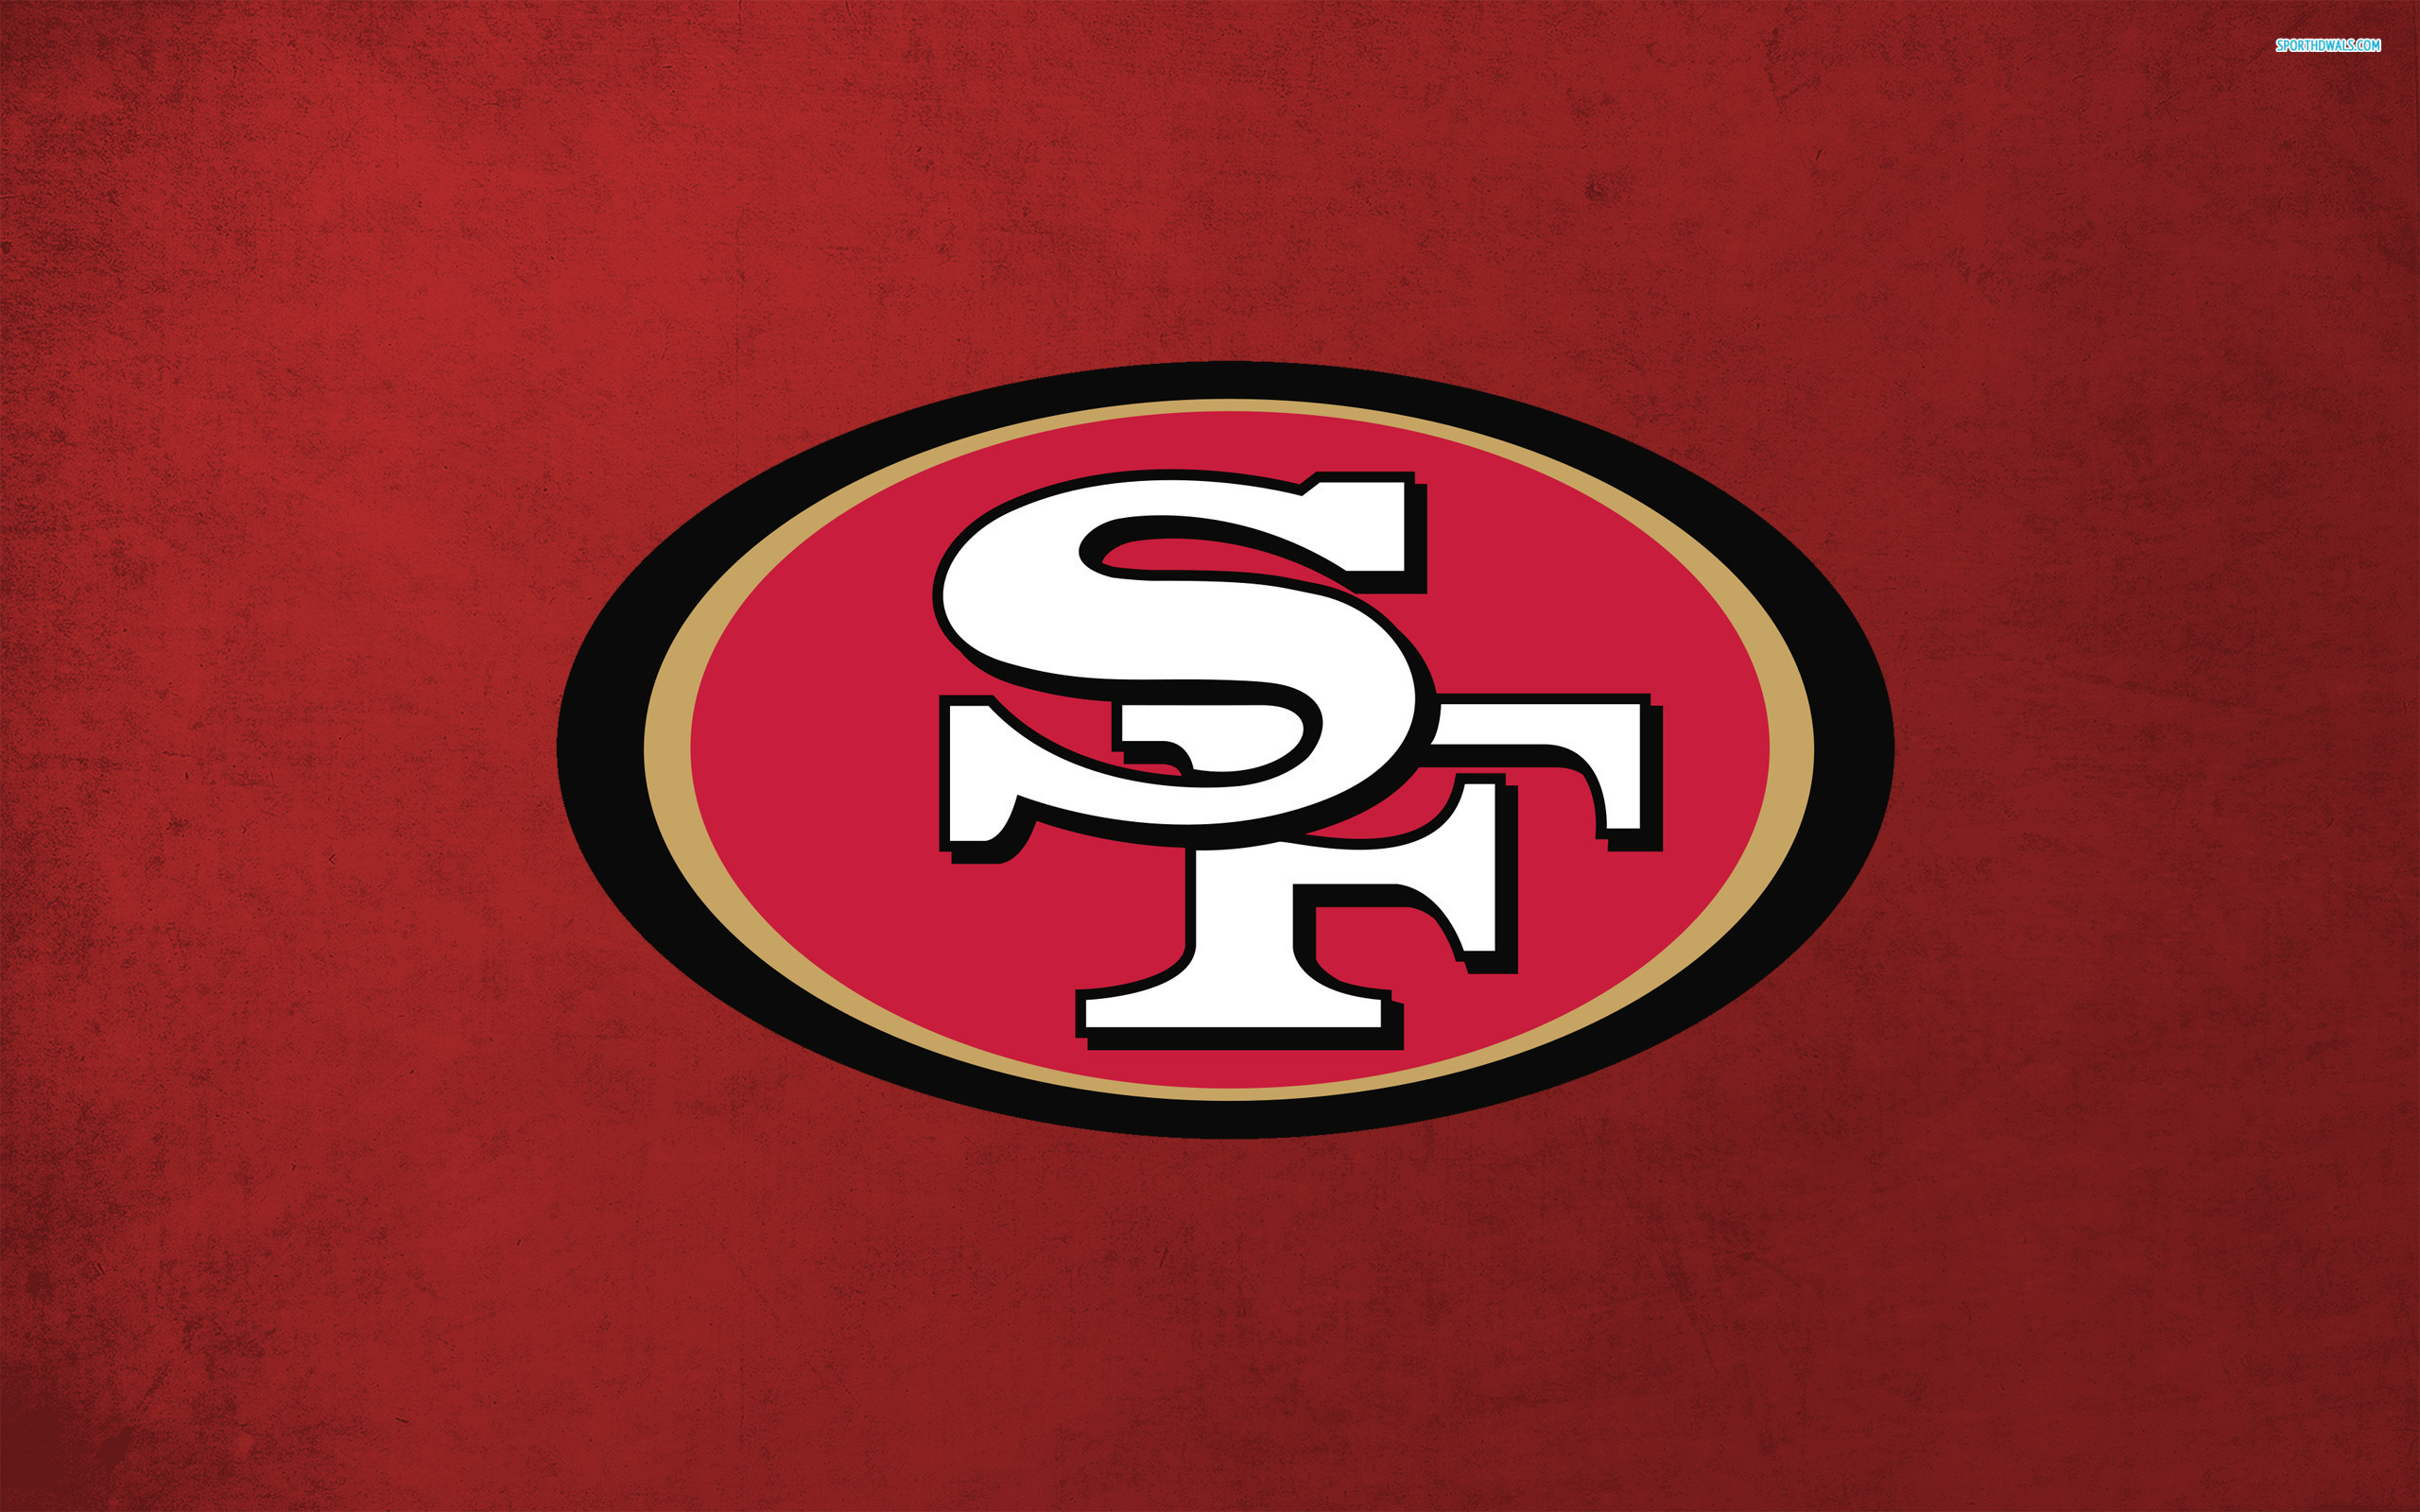 49ers Iphone Wallpaper Hd San Francisco 49ers Full Hd Bakgrund And Bakgrund